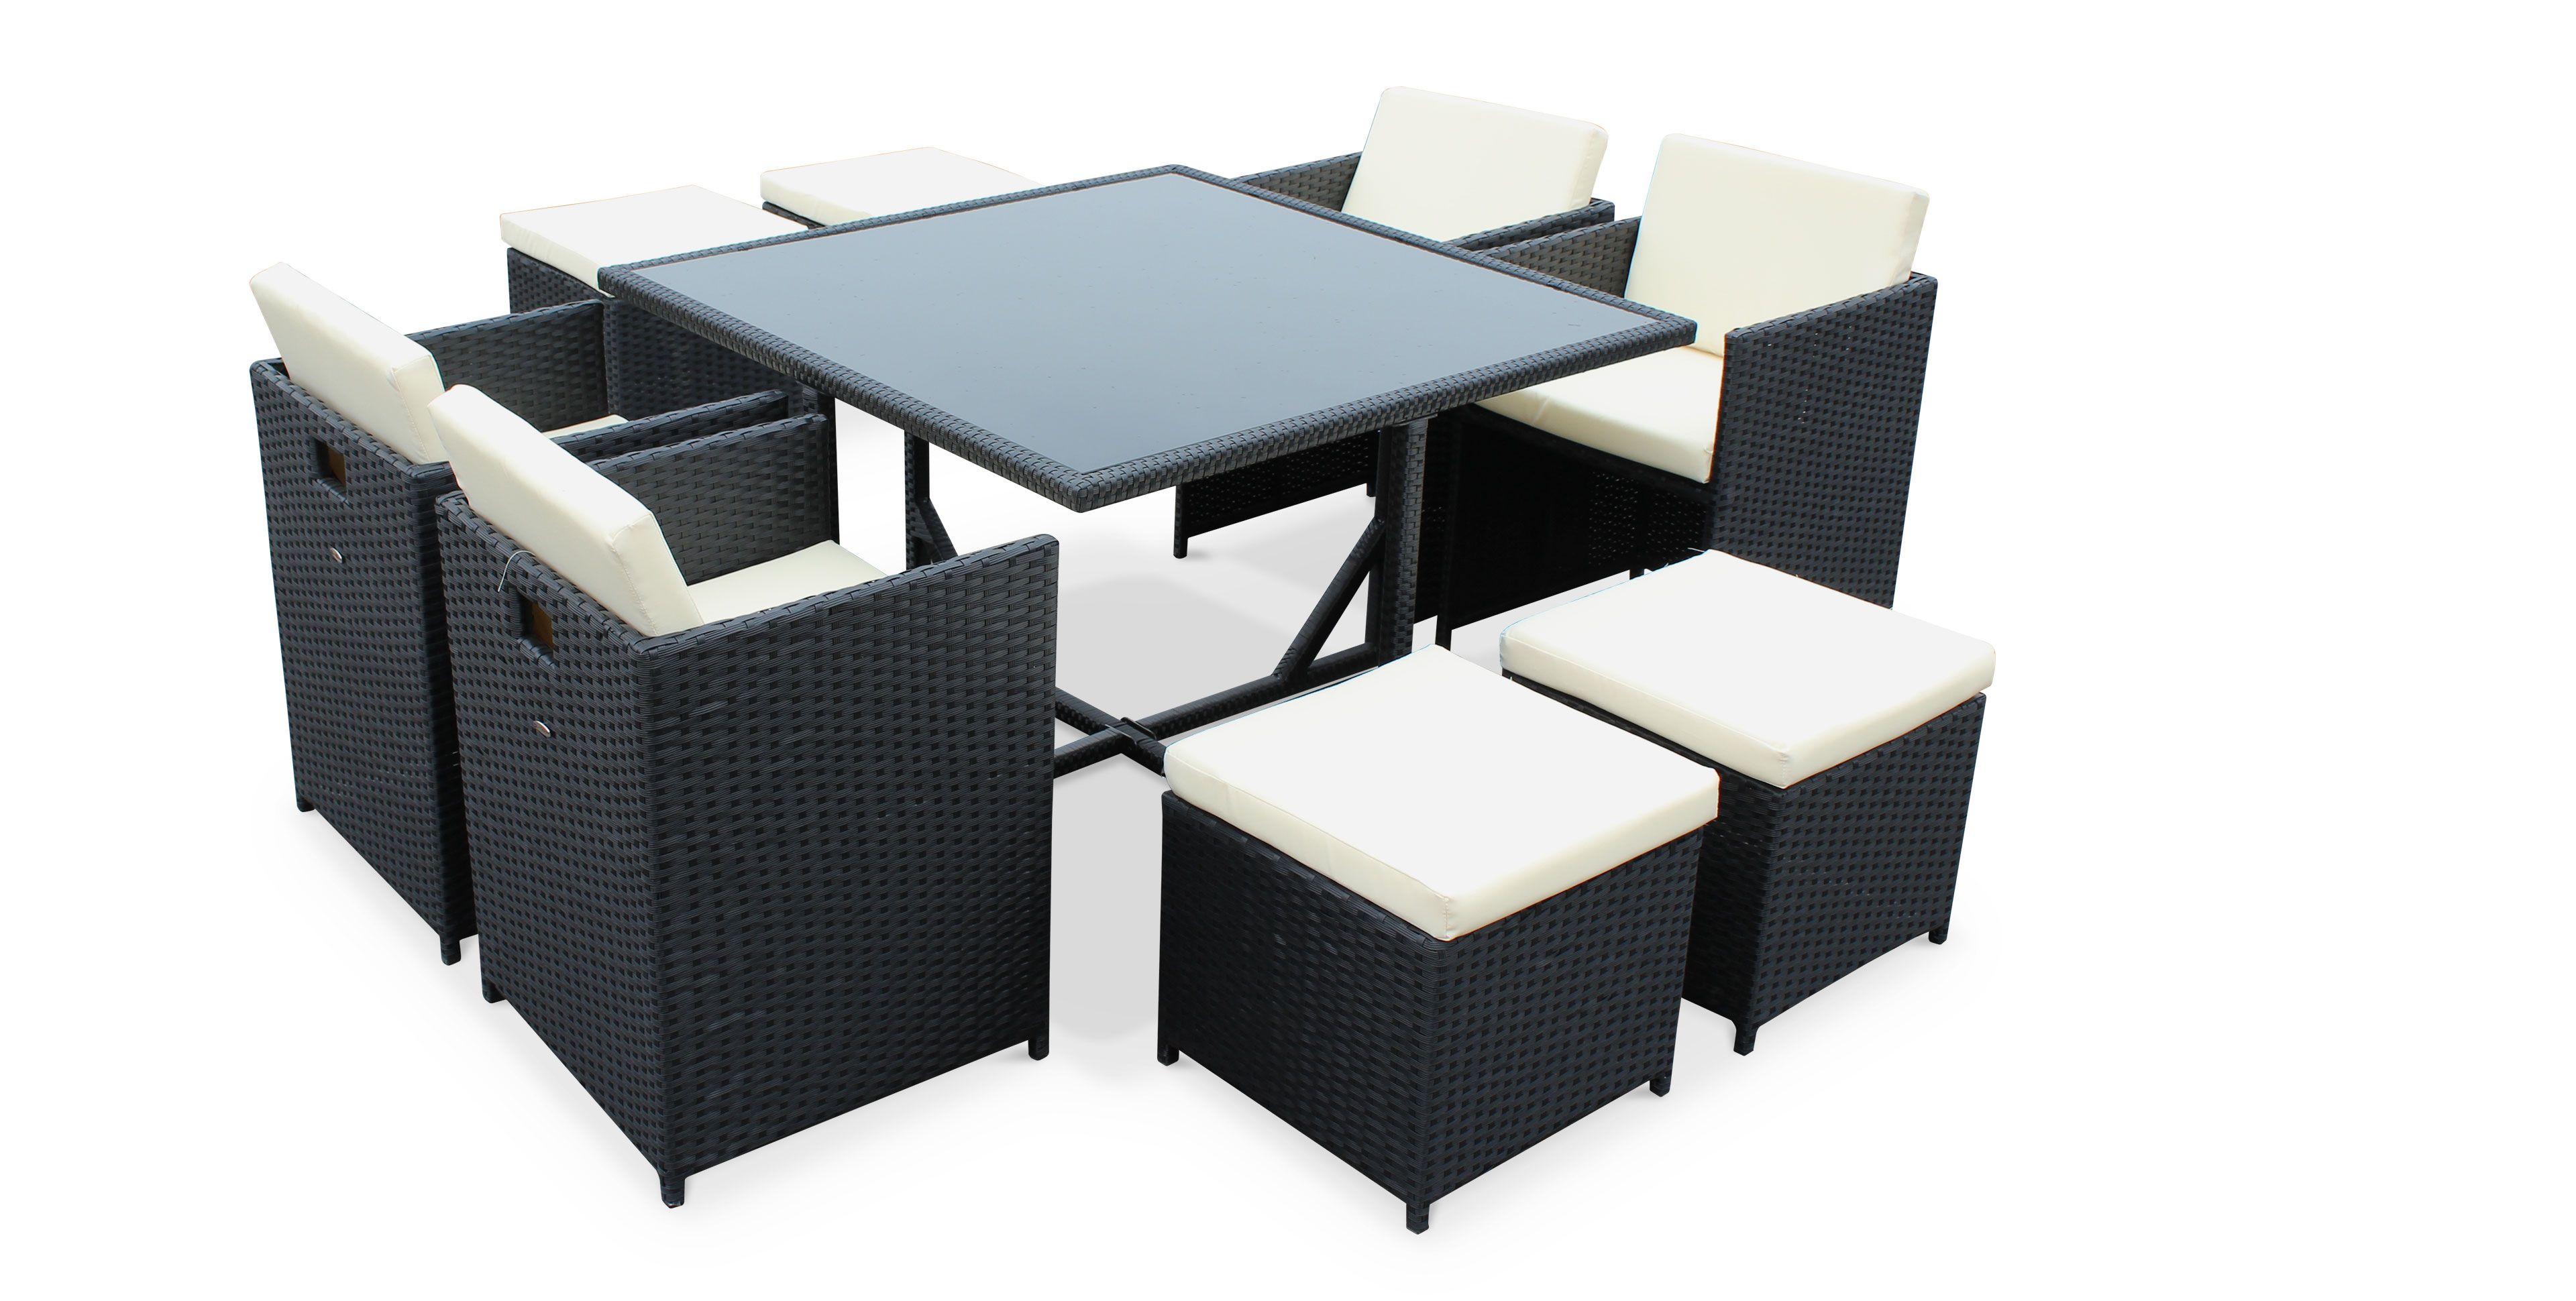 Salon de jardin vasto noir table en résine tressée ...